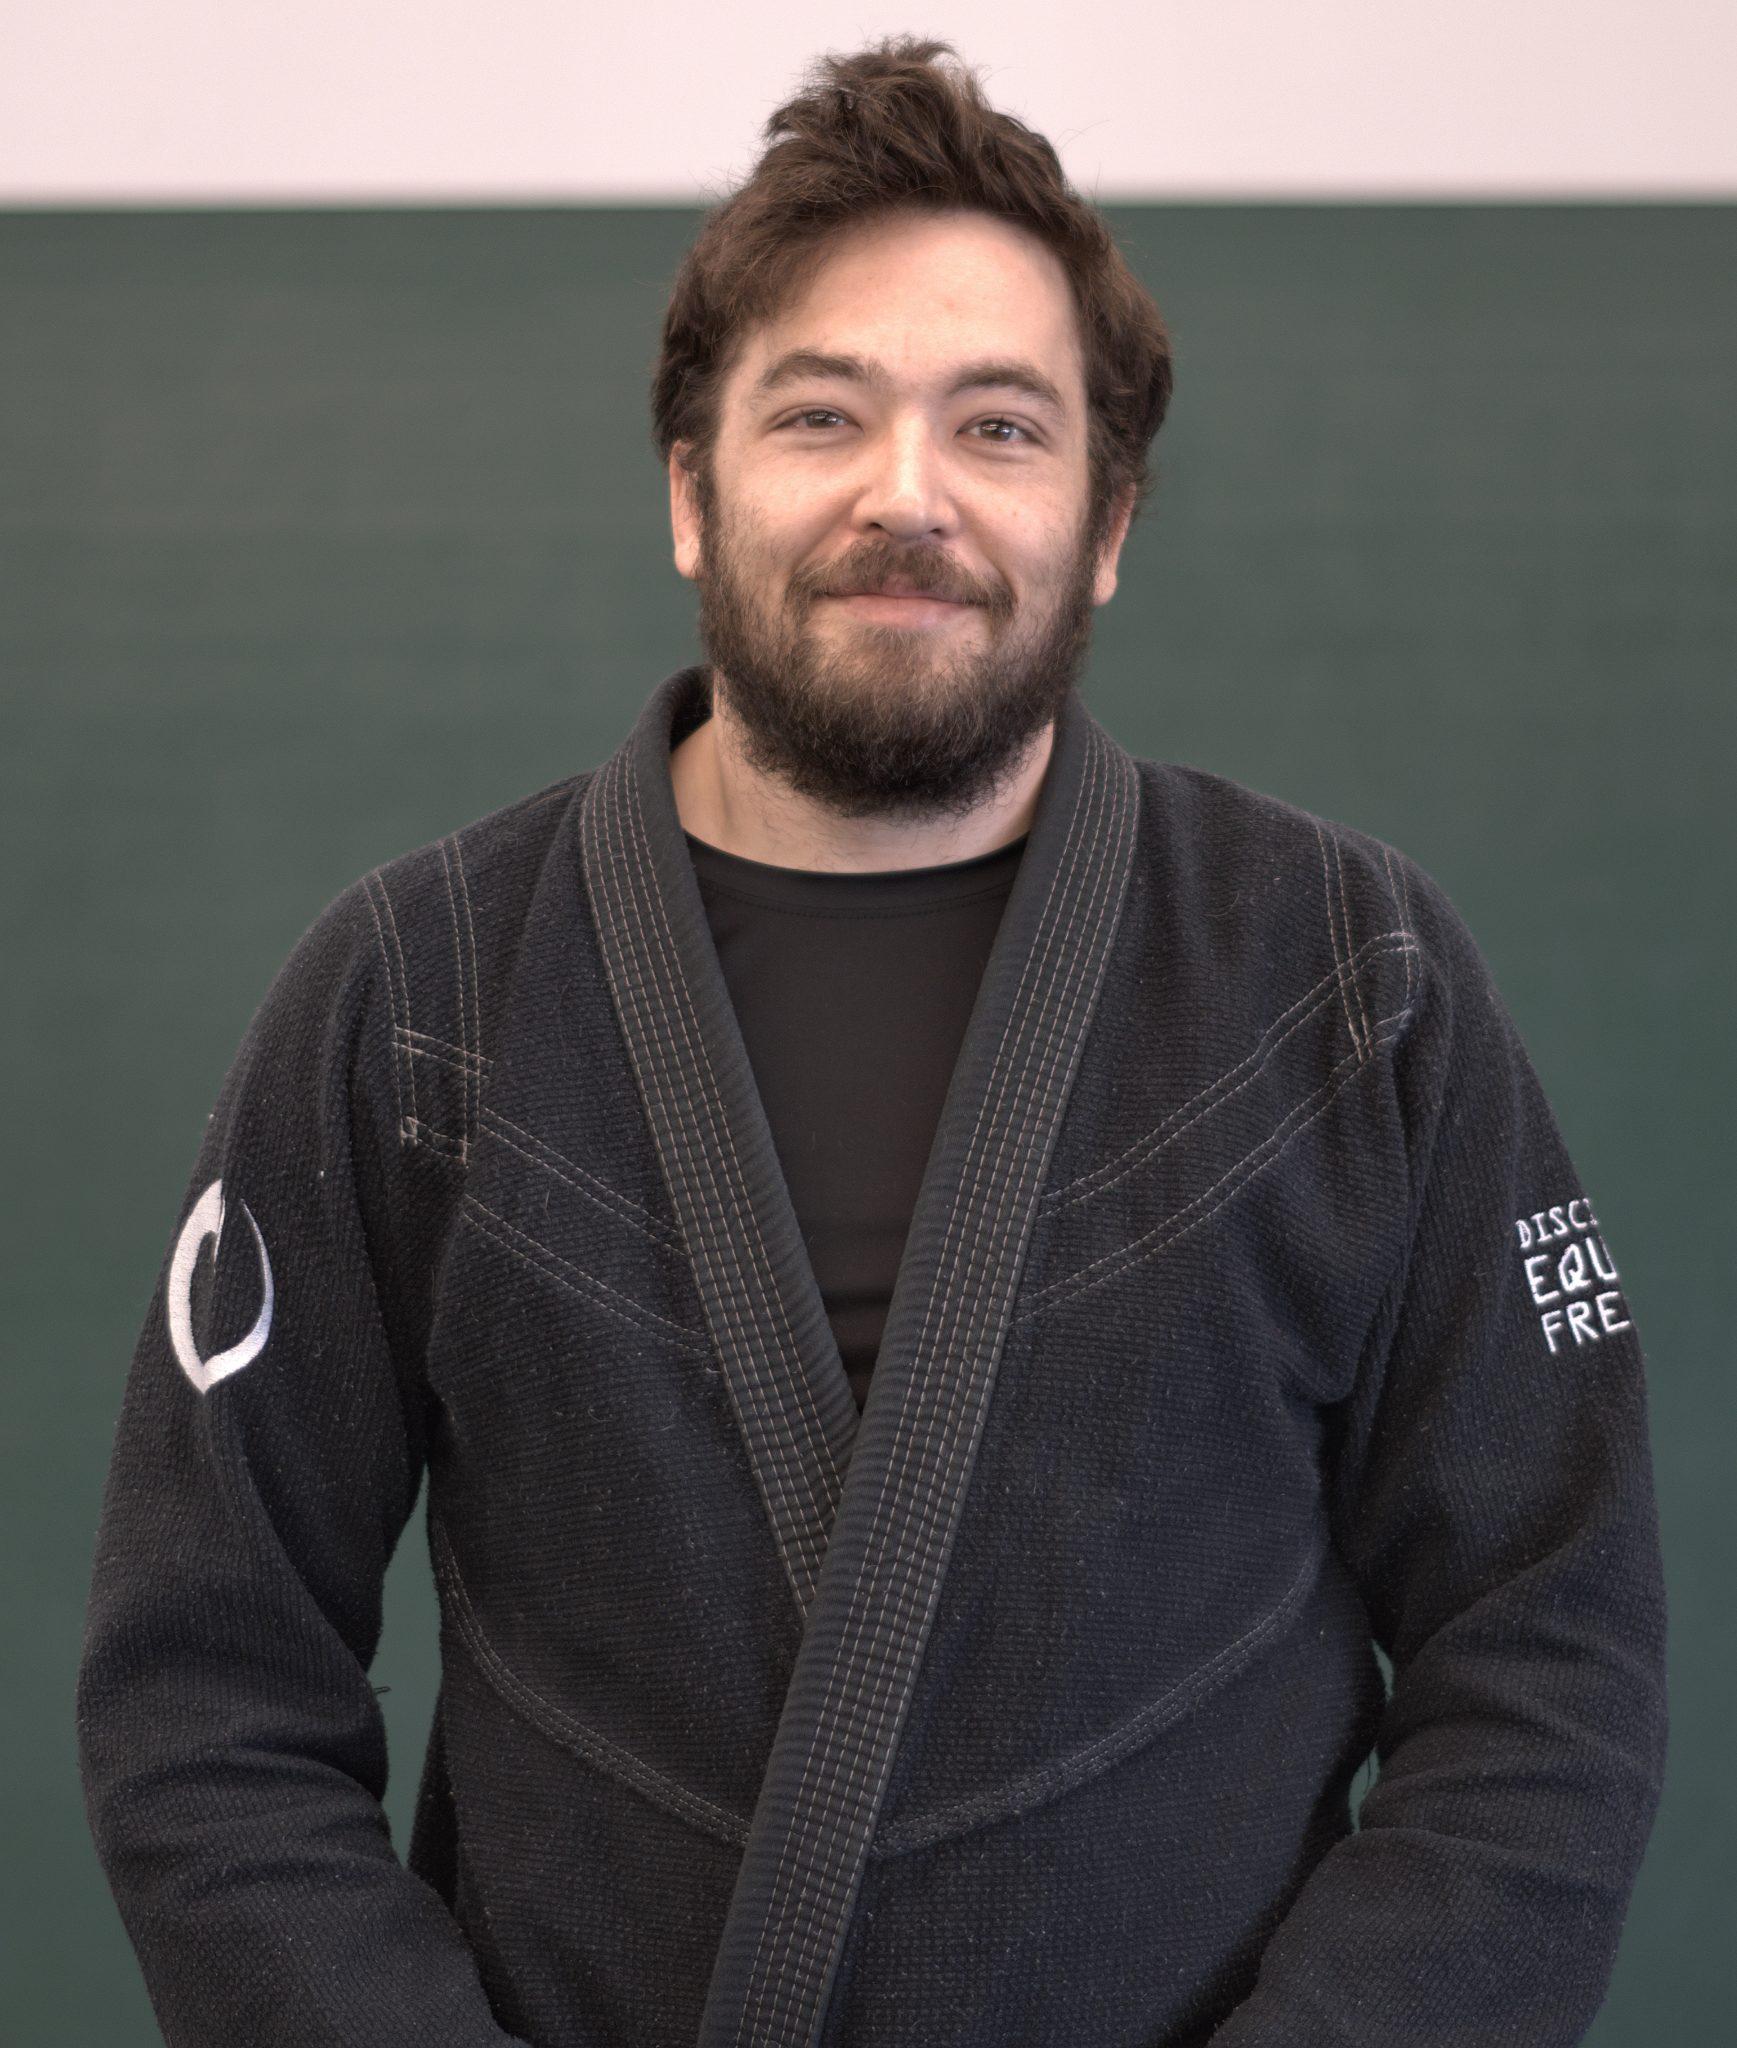 Coach Adam Pedigo - Blue Belt | Youth Jiu Jitsu | Jiu Jitsu Fundamentals